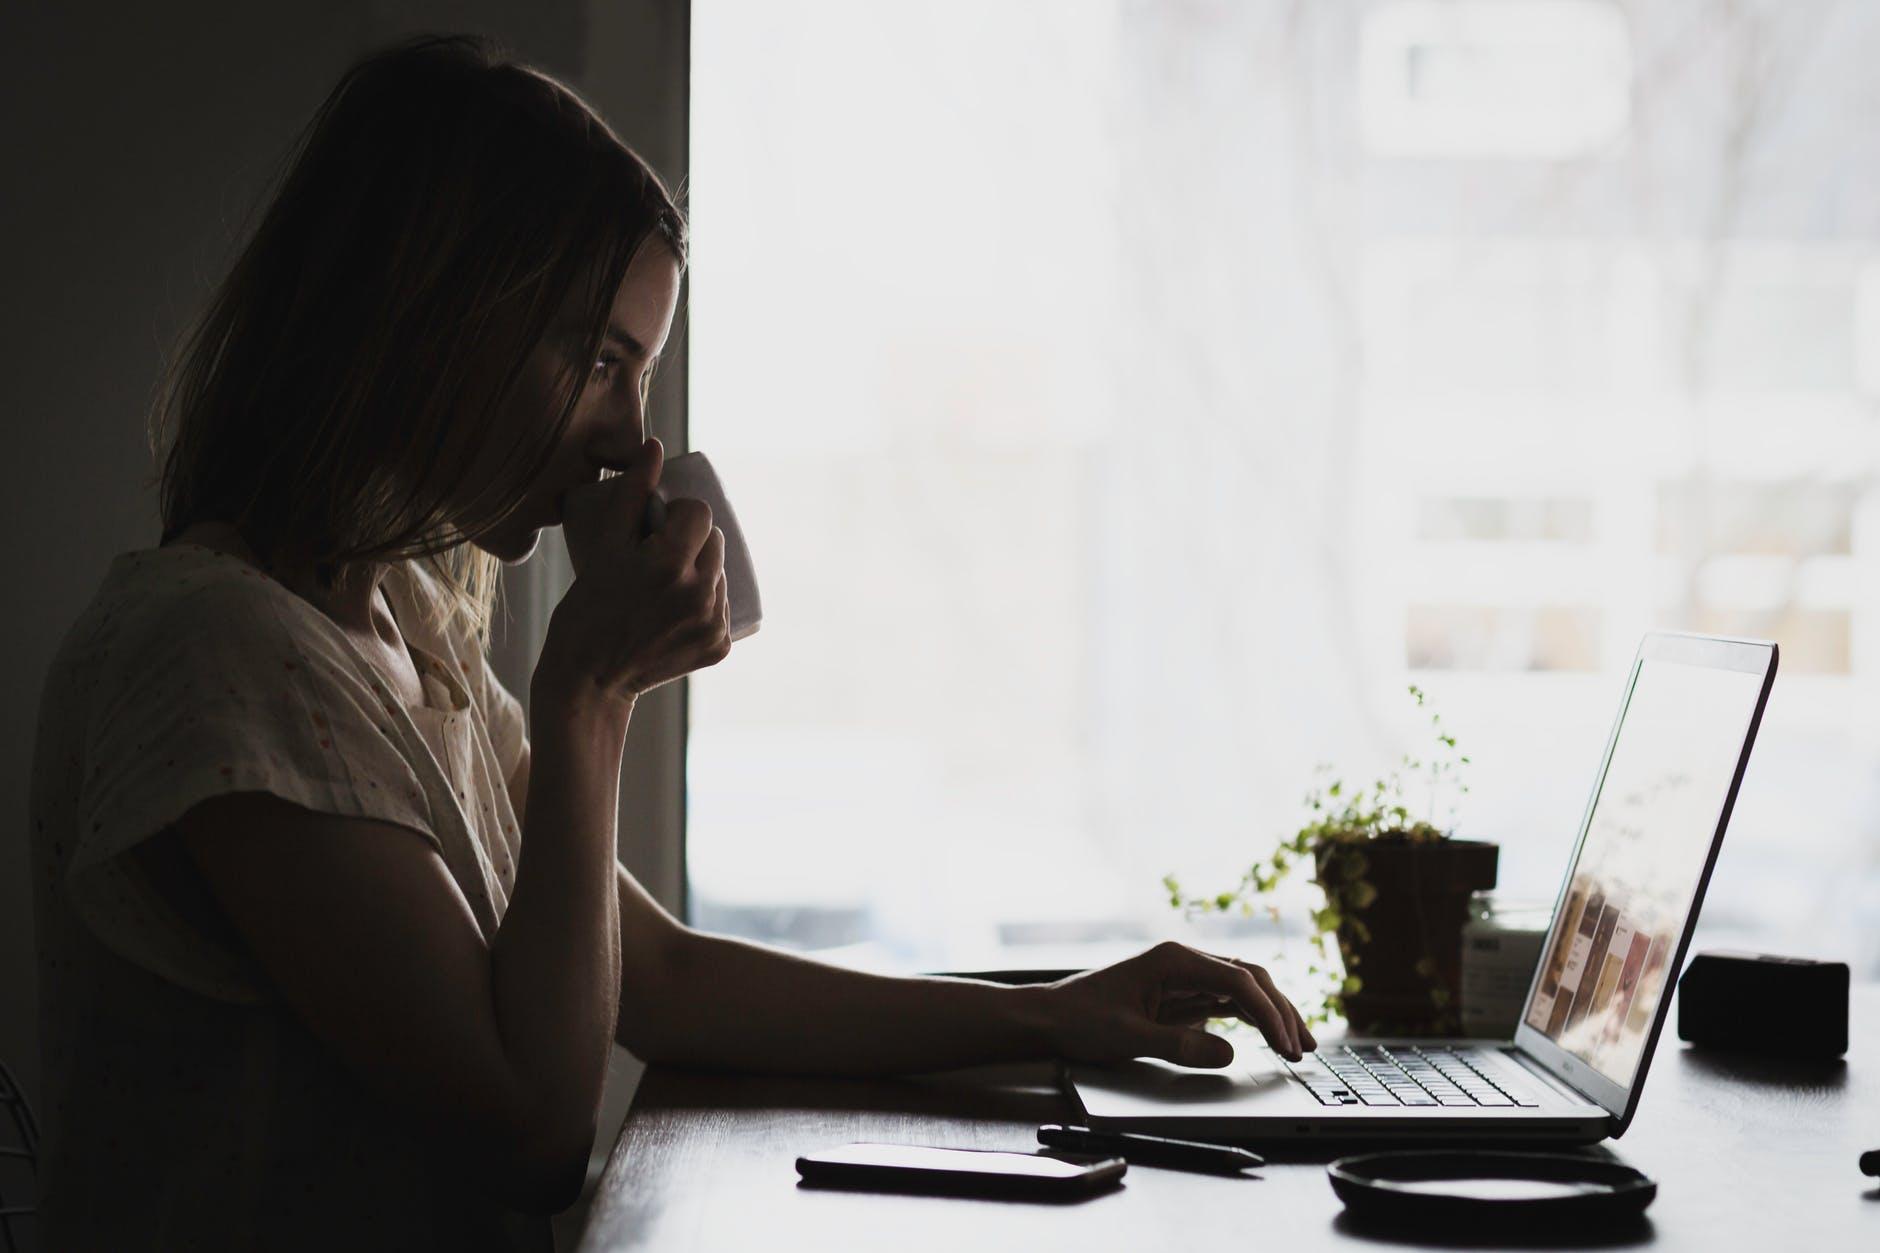 8 Pinjaman Kilat Online yang Aman & Mudah